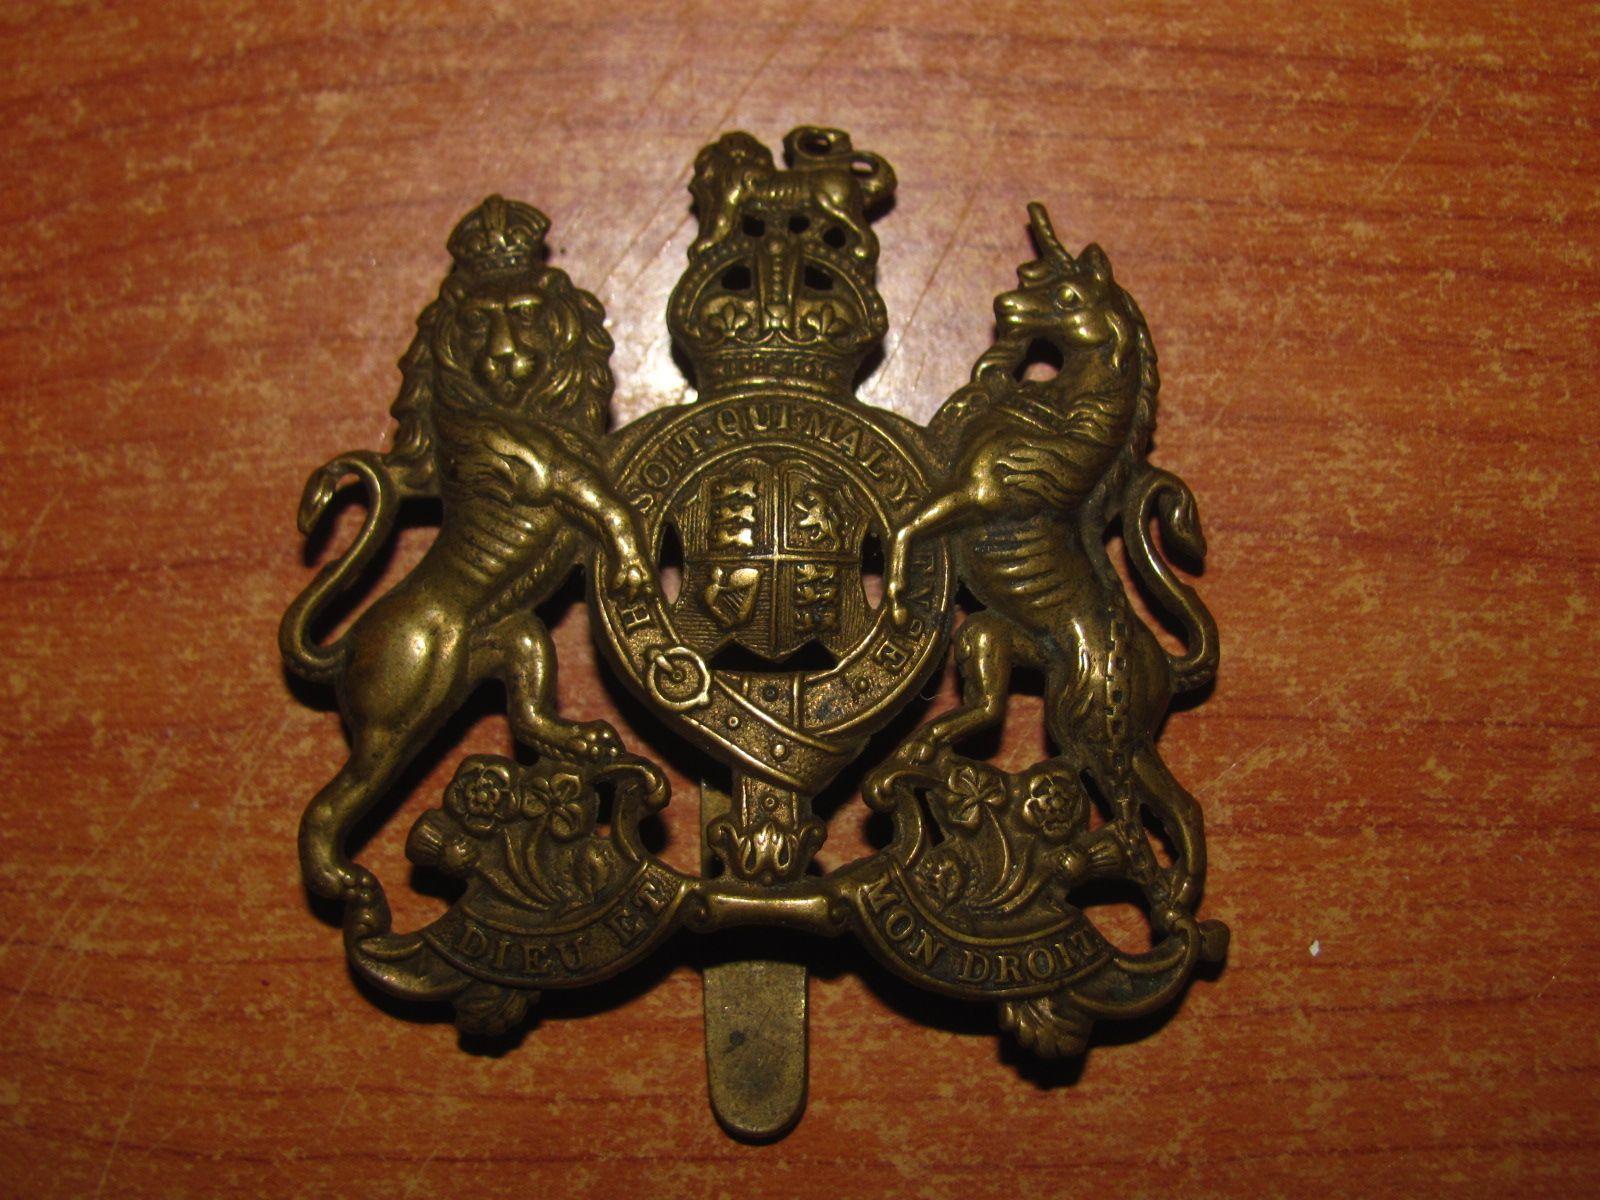 cap badge du General Service Corps (UK)